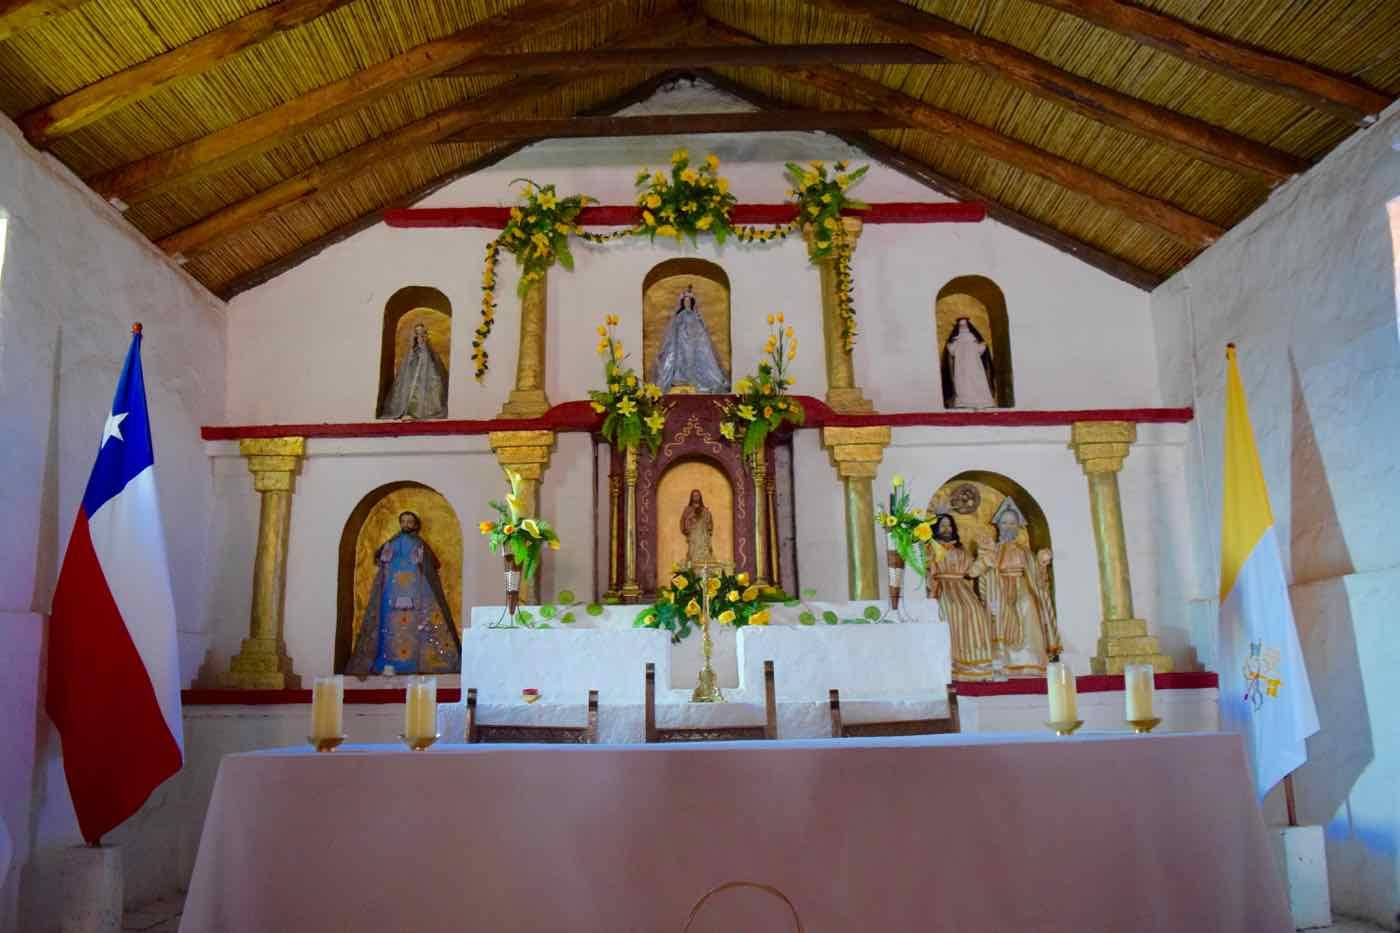 St Luke's Church, Toconao, Chile